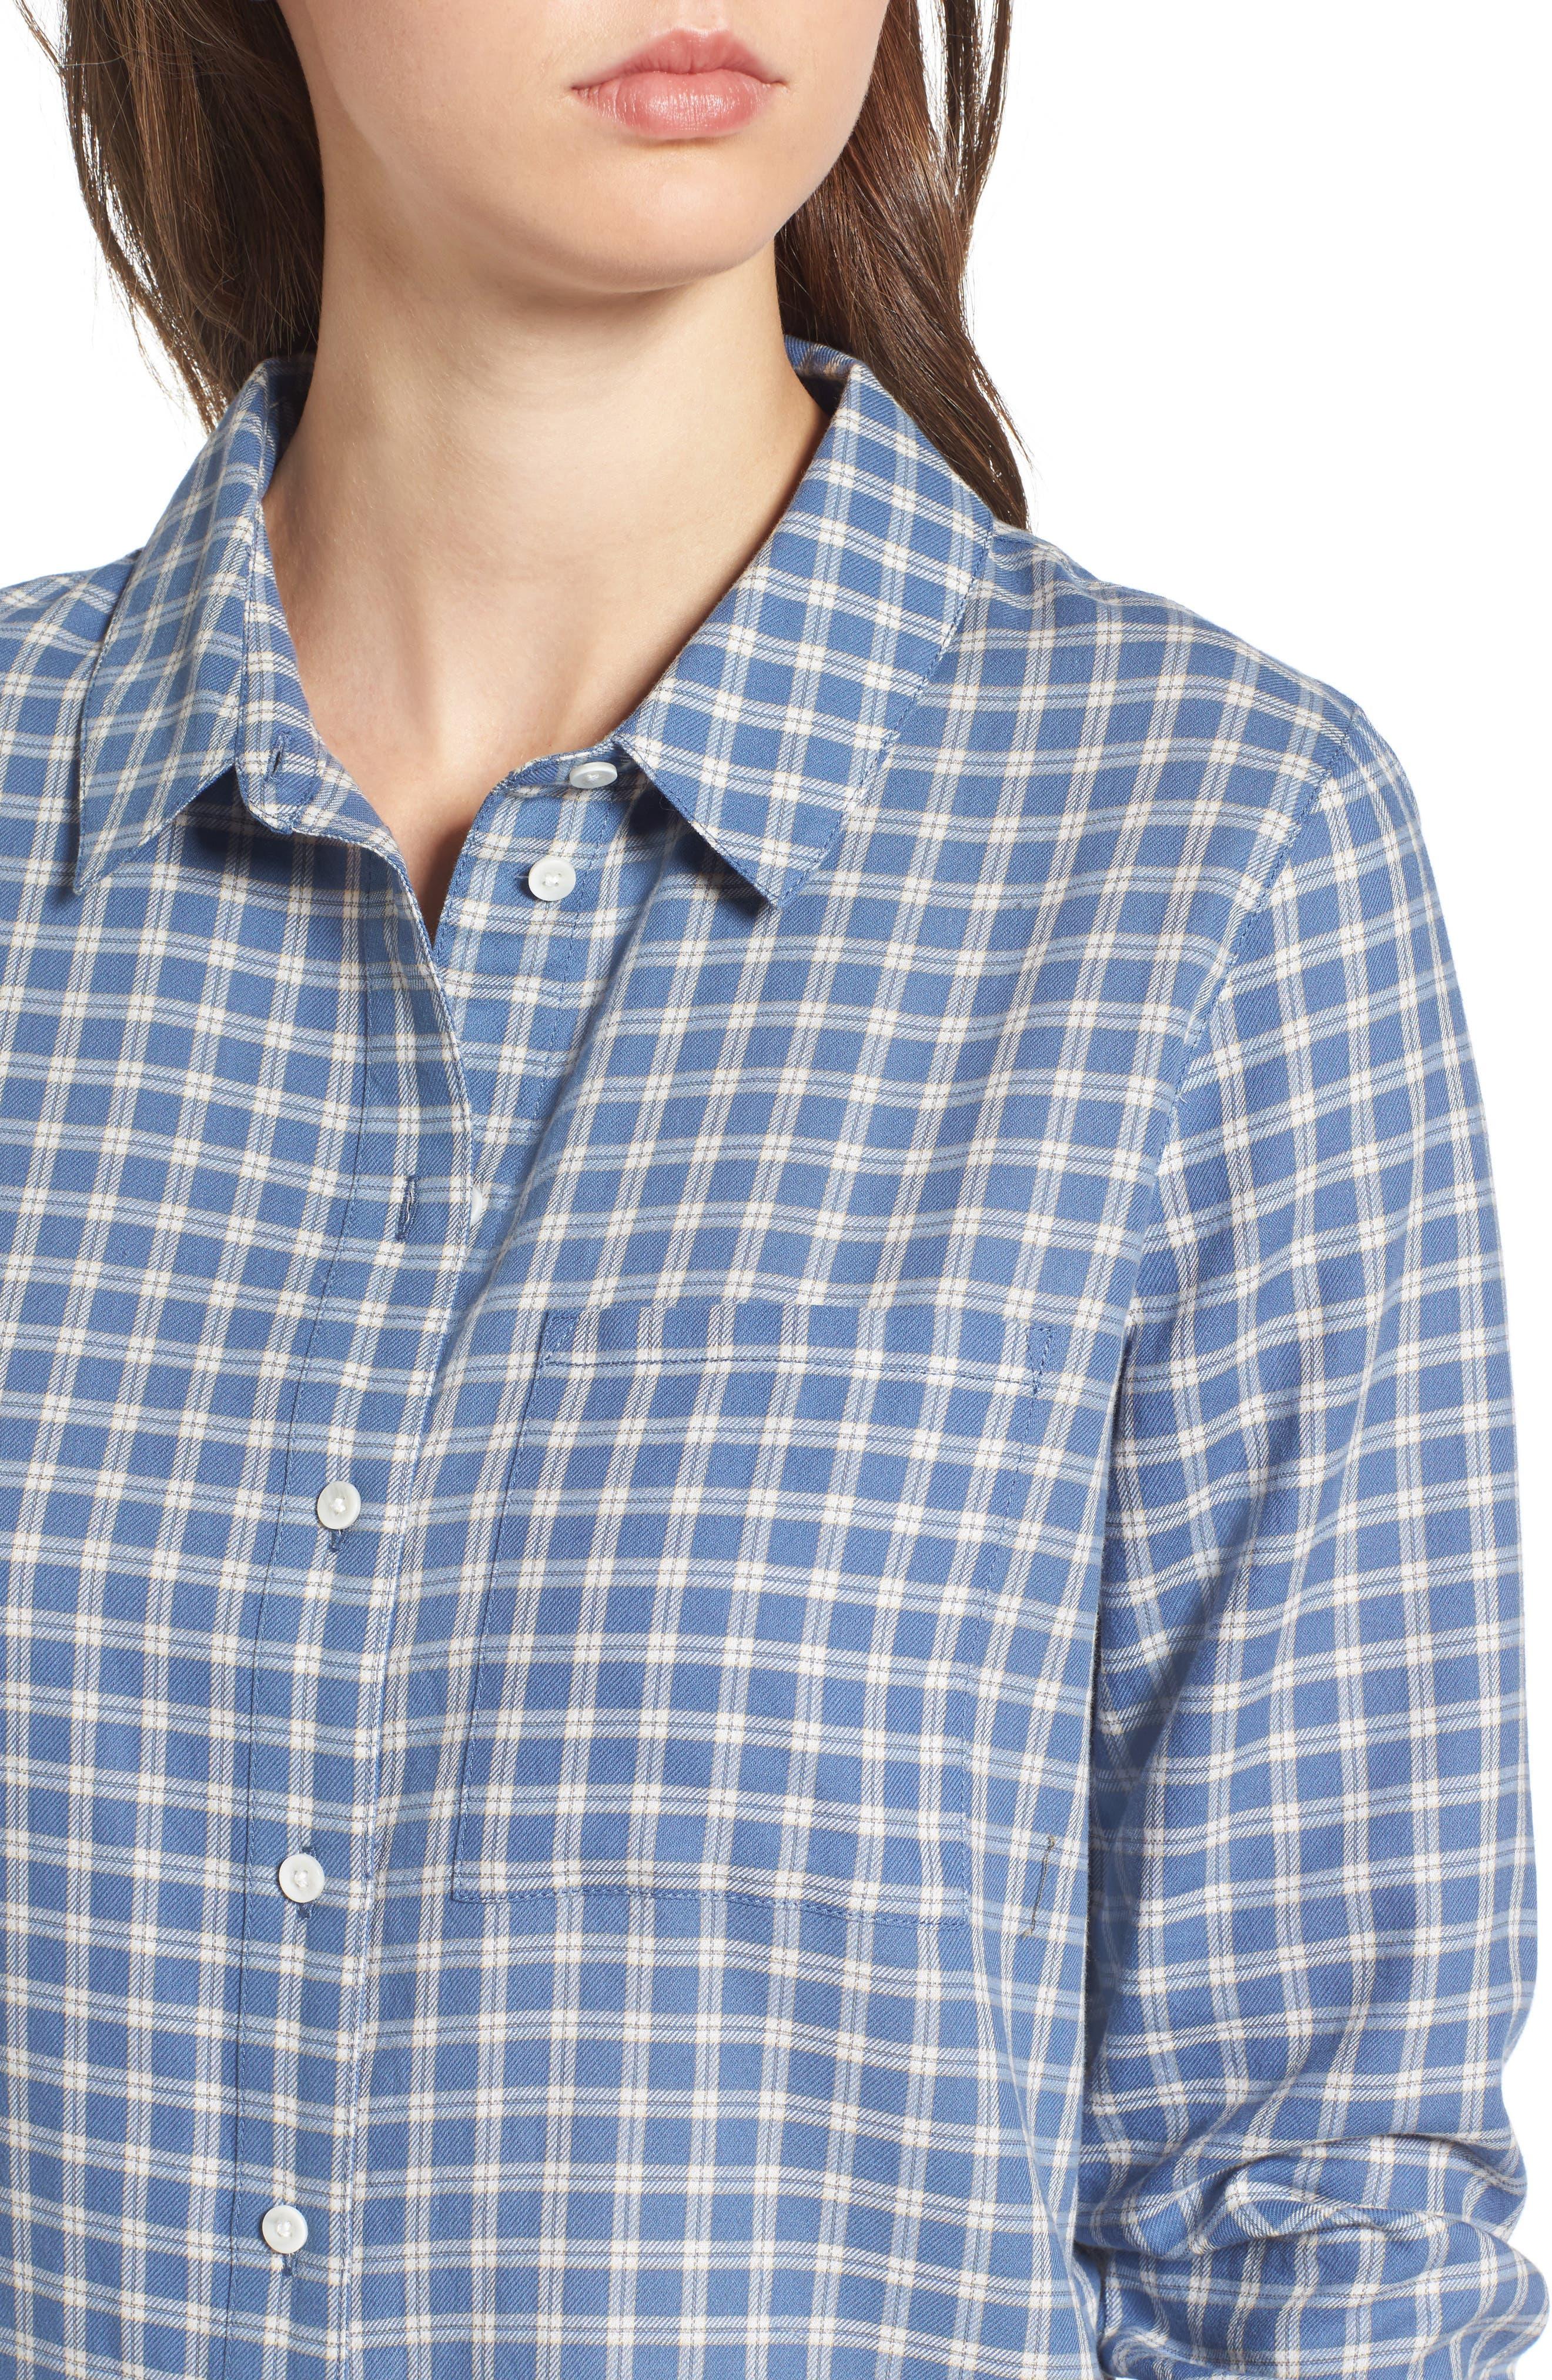 Classic Plaid Shirt,                             Alternate thumbnail 4, color,                             Blue Moonlight Grid Check